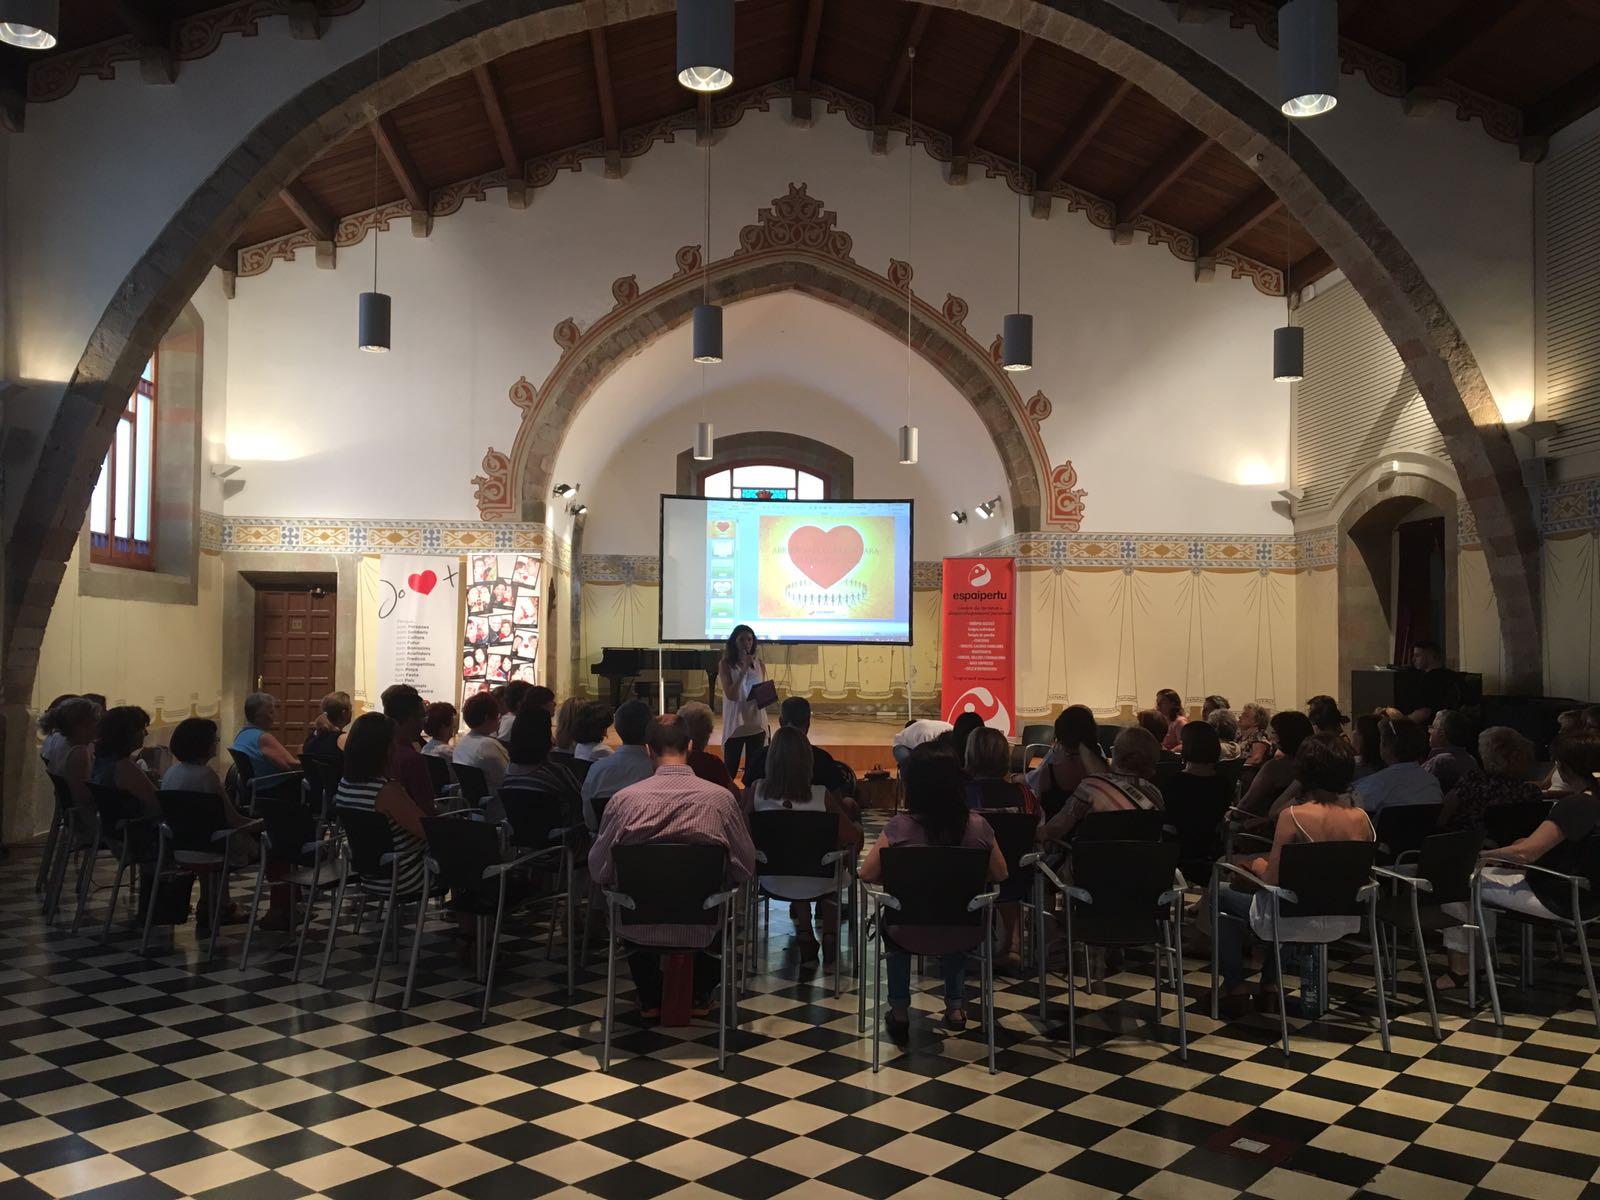 conferencia_nuriaremus_grancentre_granollers